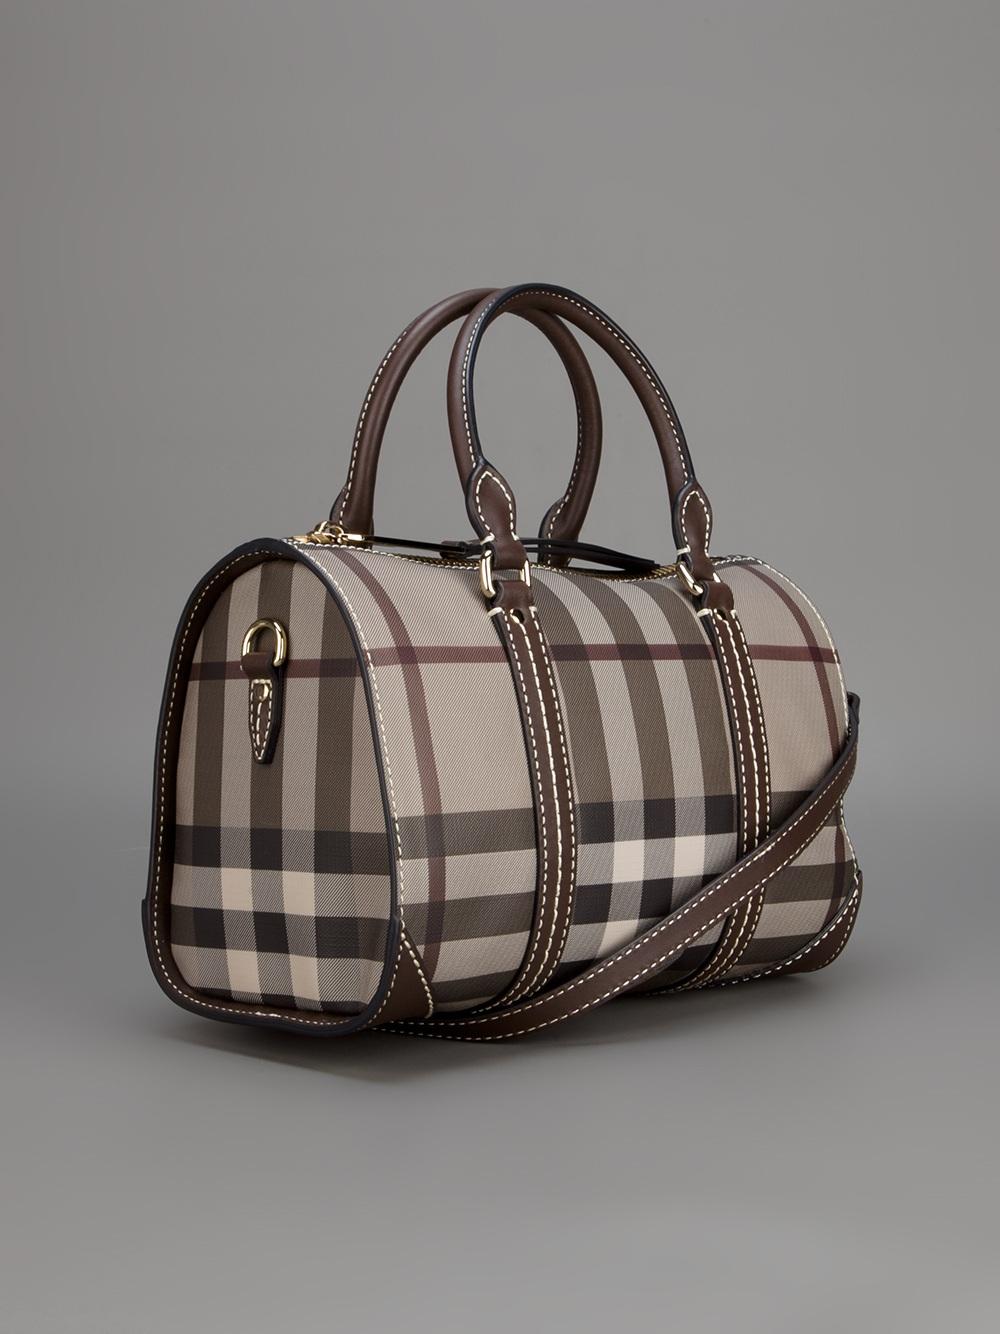 24b313cabc54 Burberry Check Bowling Bag in Gray - Lyst